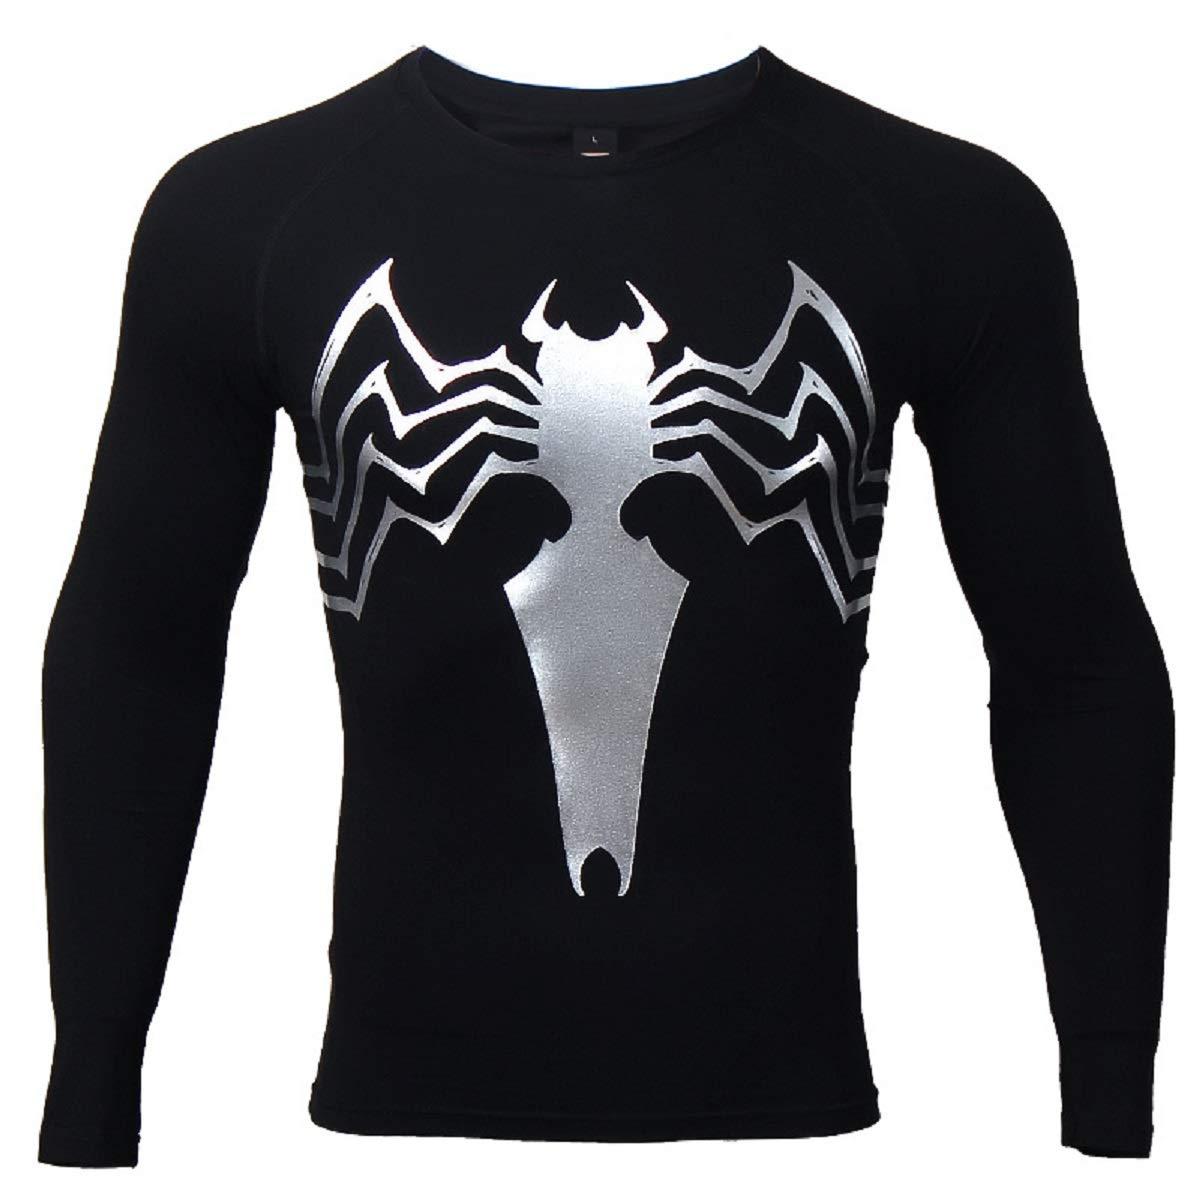 8593b2bb Amazon.com: Spider Compression Shirt 3D Print T-Shirt Men Gym Tight Tops  Black: Clothing